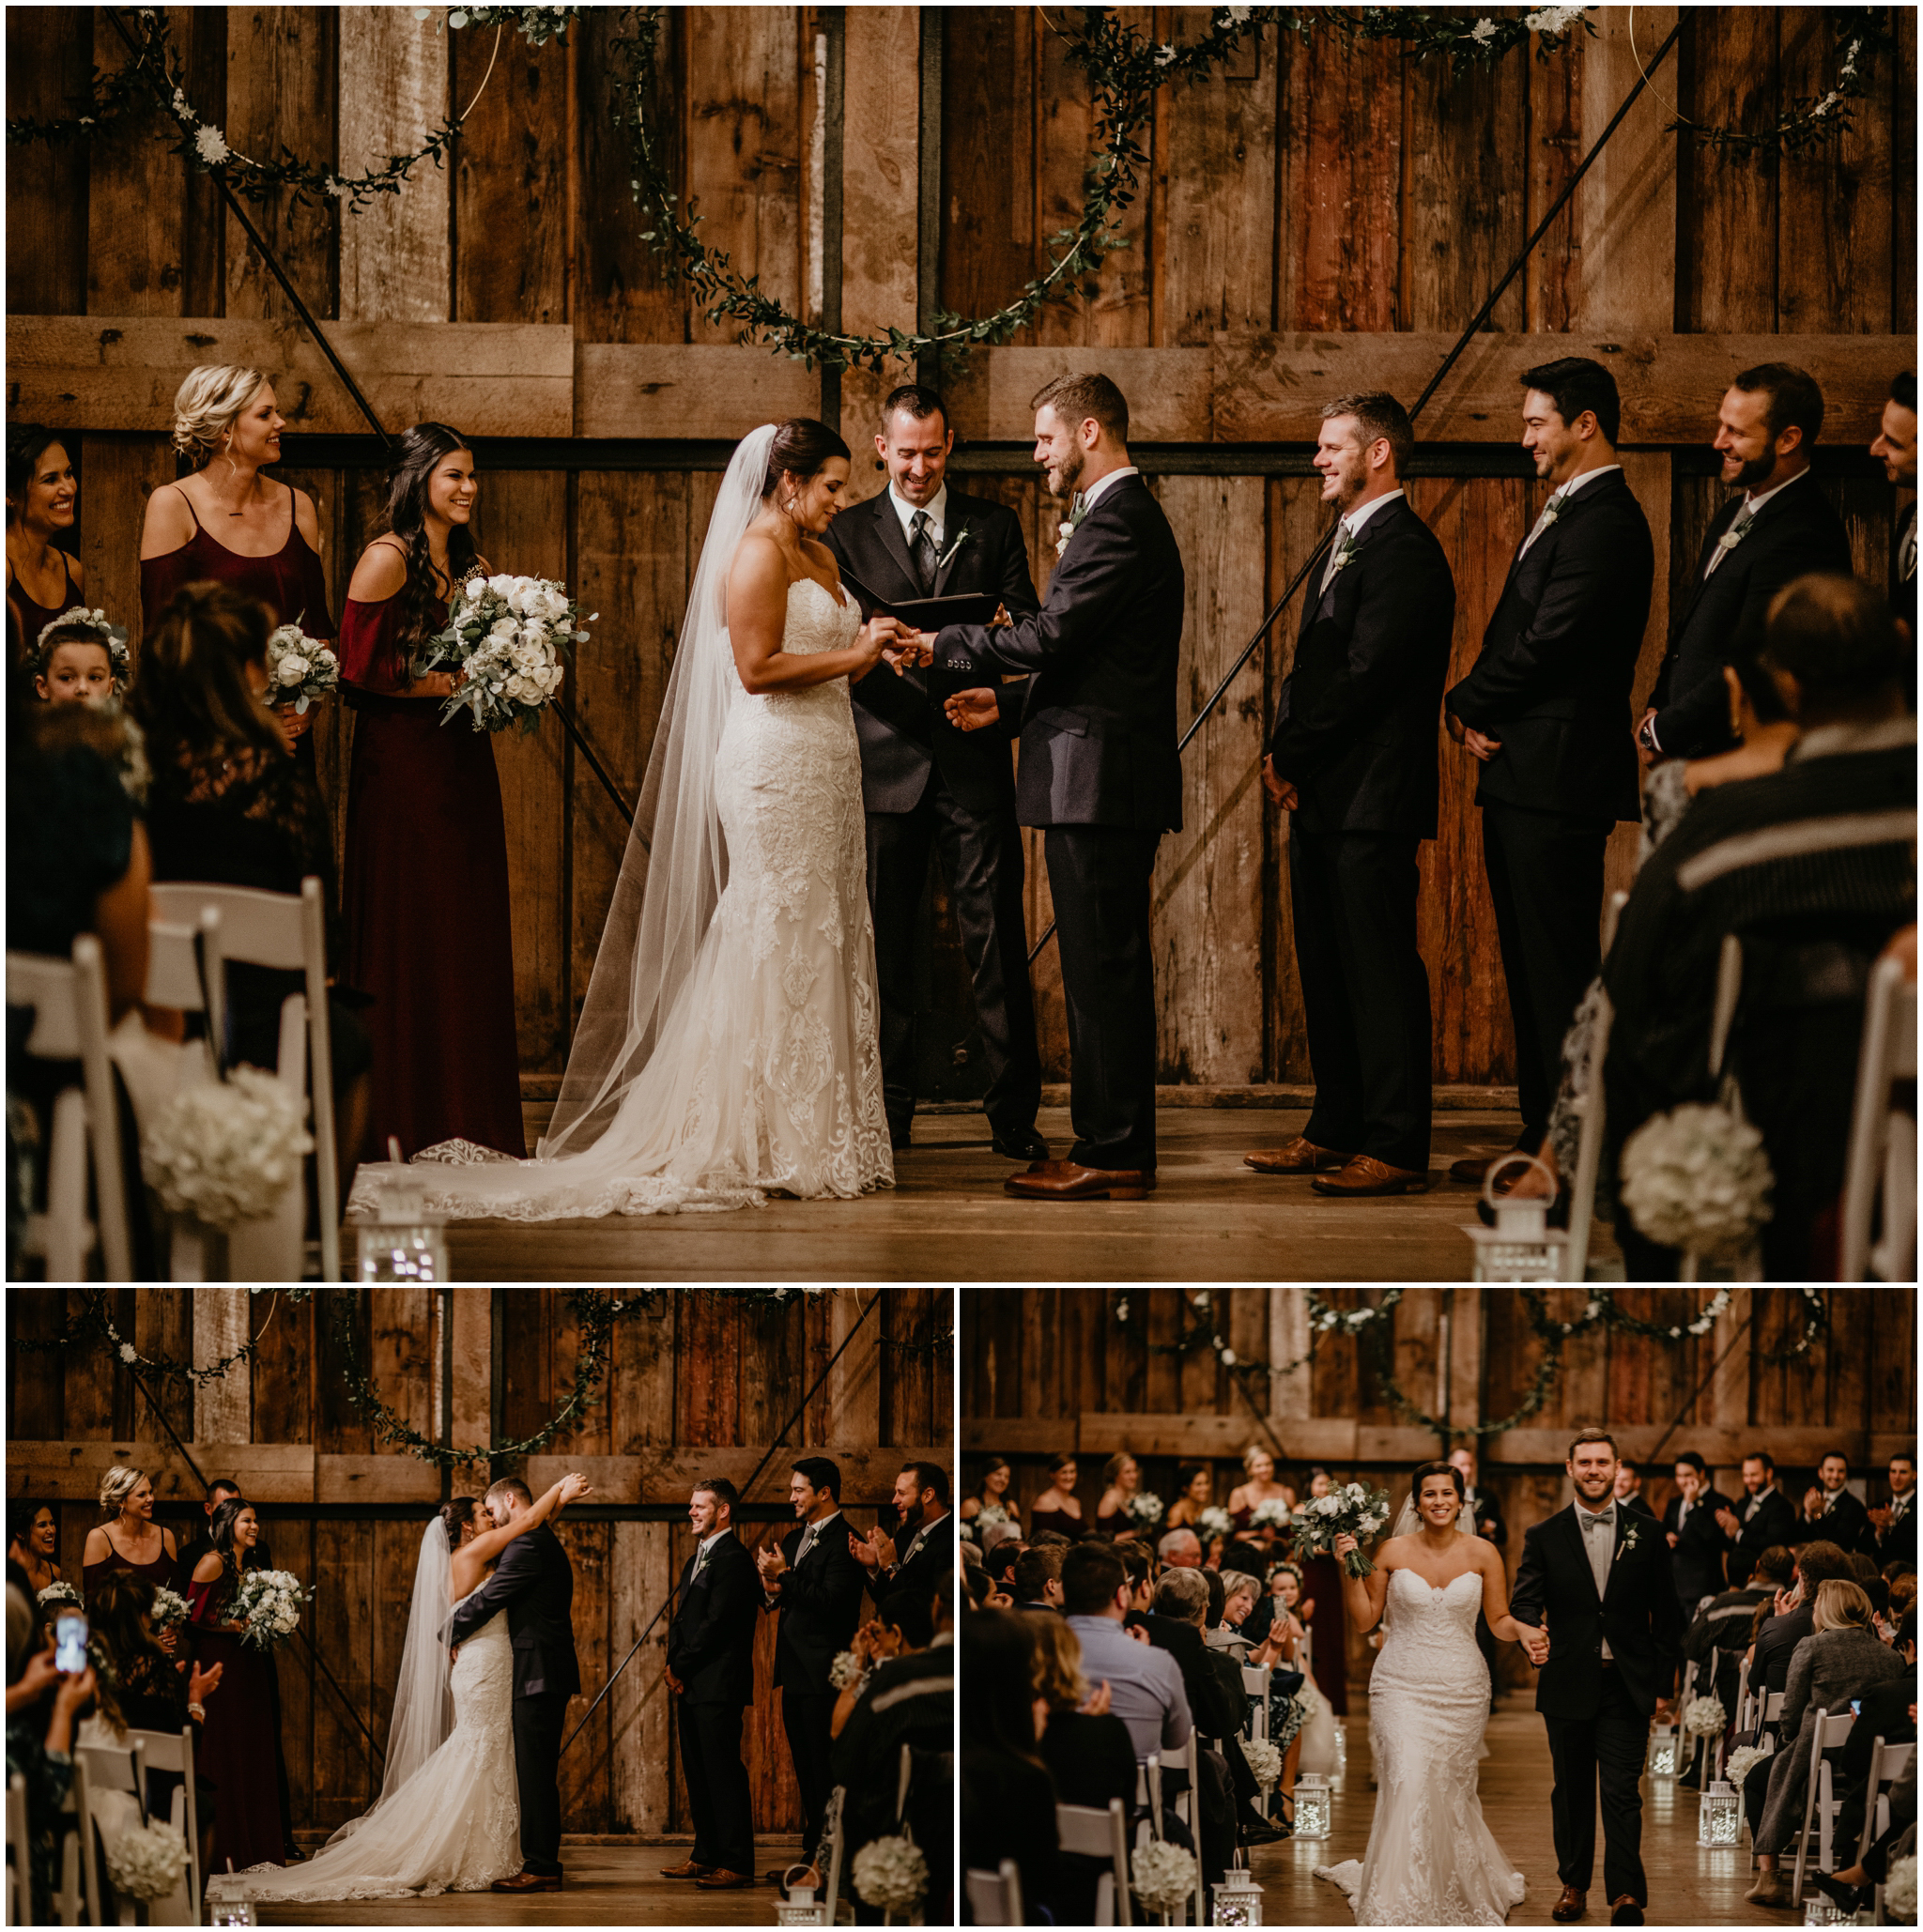 ashley-tj-the-pickering-barn-winter-wedding-seattle-photographer-069.jpg